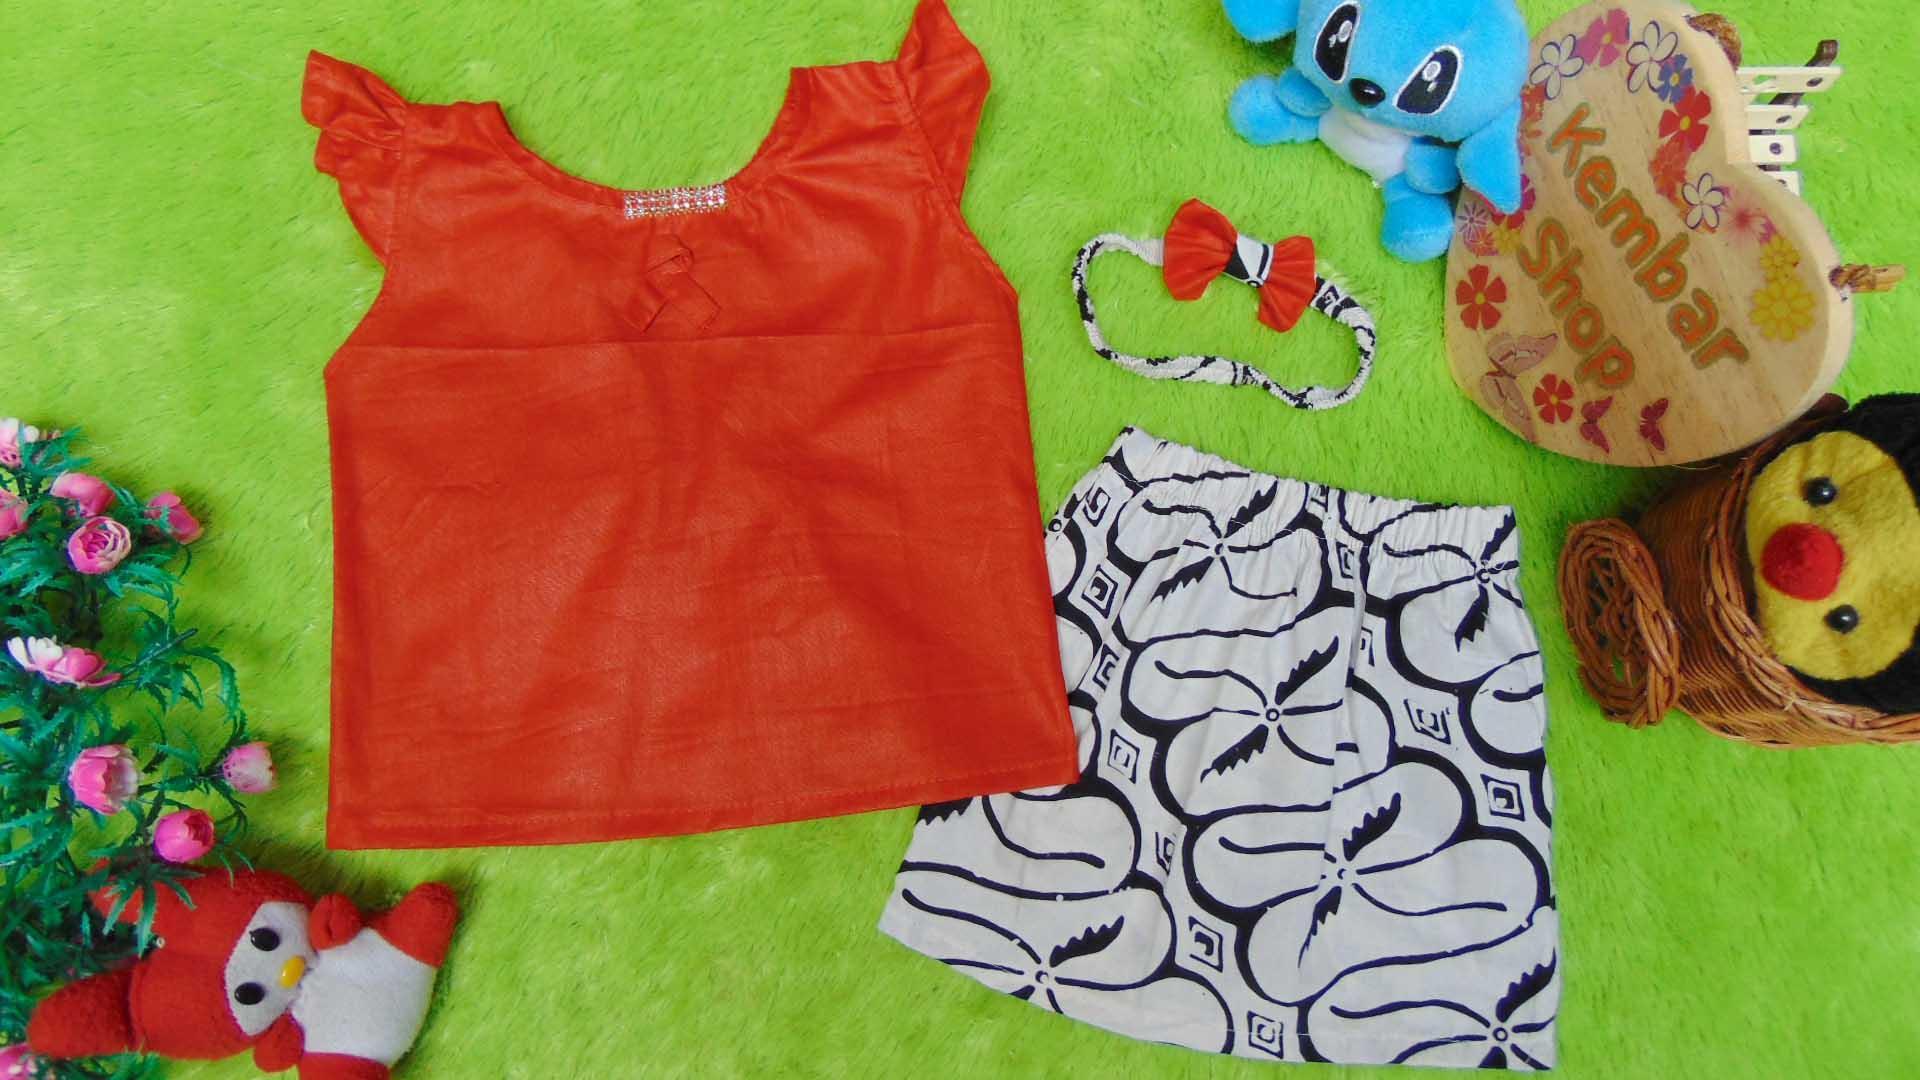 kembarshop-Setelan Baju Kebaya Kutu Baru Bayi Newborn 0-18bulan Plus Headband Polos Diamond